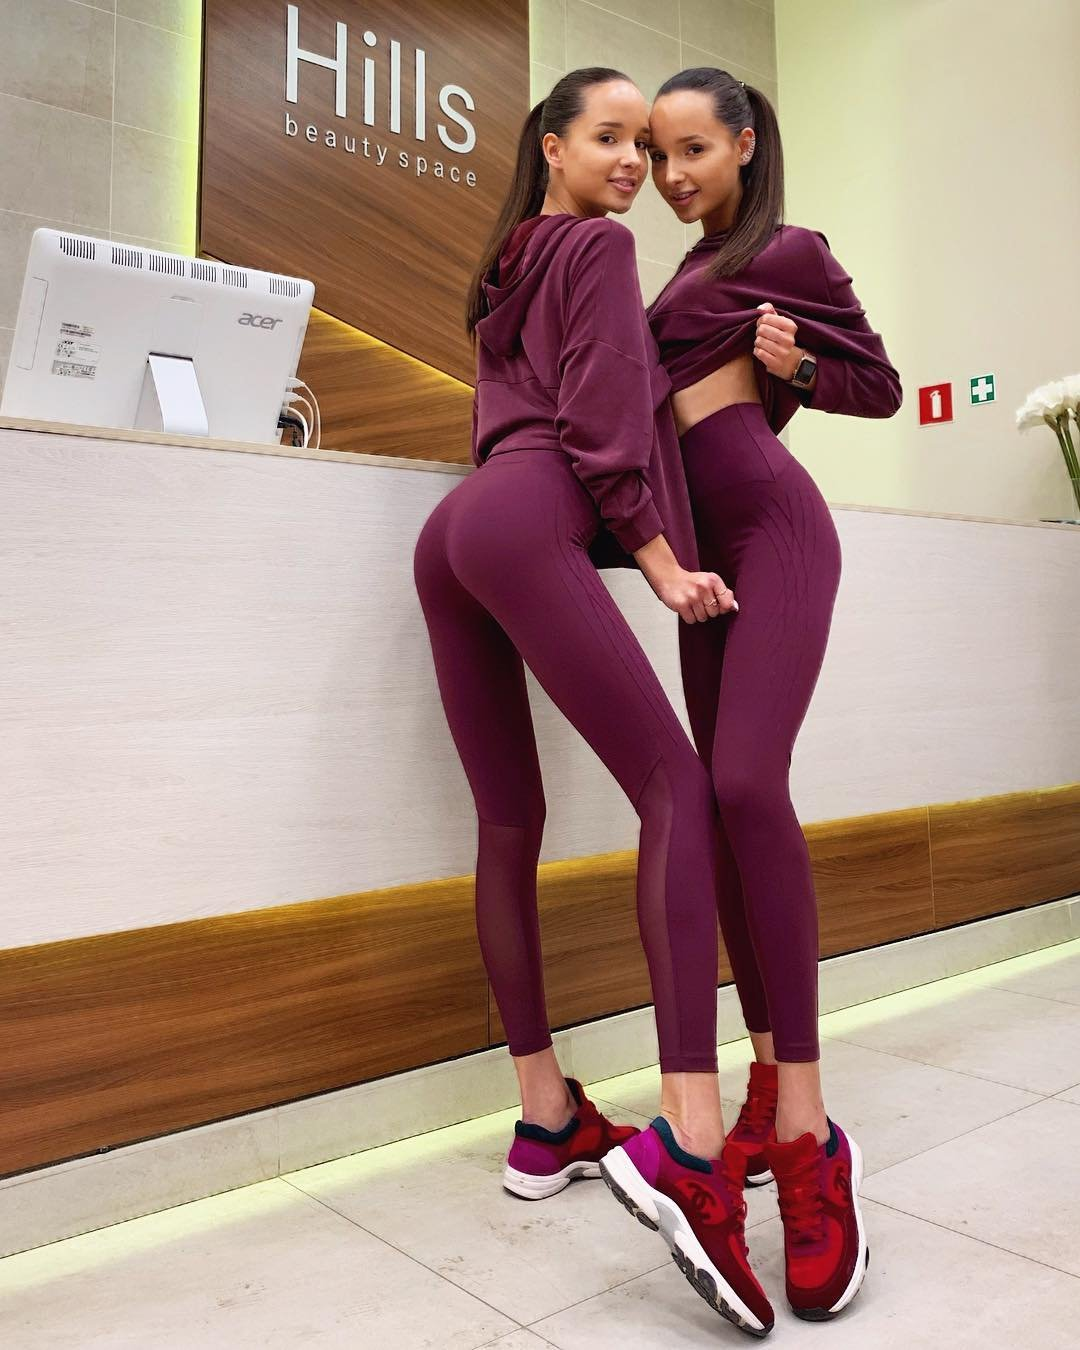 Rainbow striped lgbt flag womens gym yoga pants fashion workout pants girls clothing women